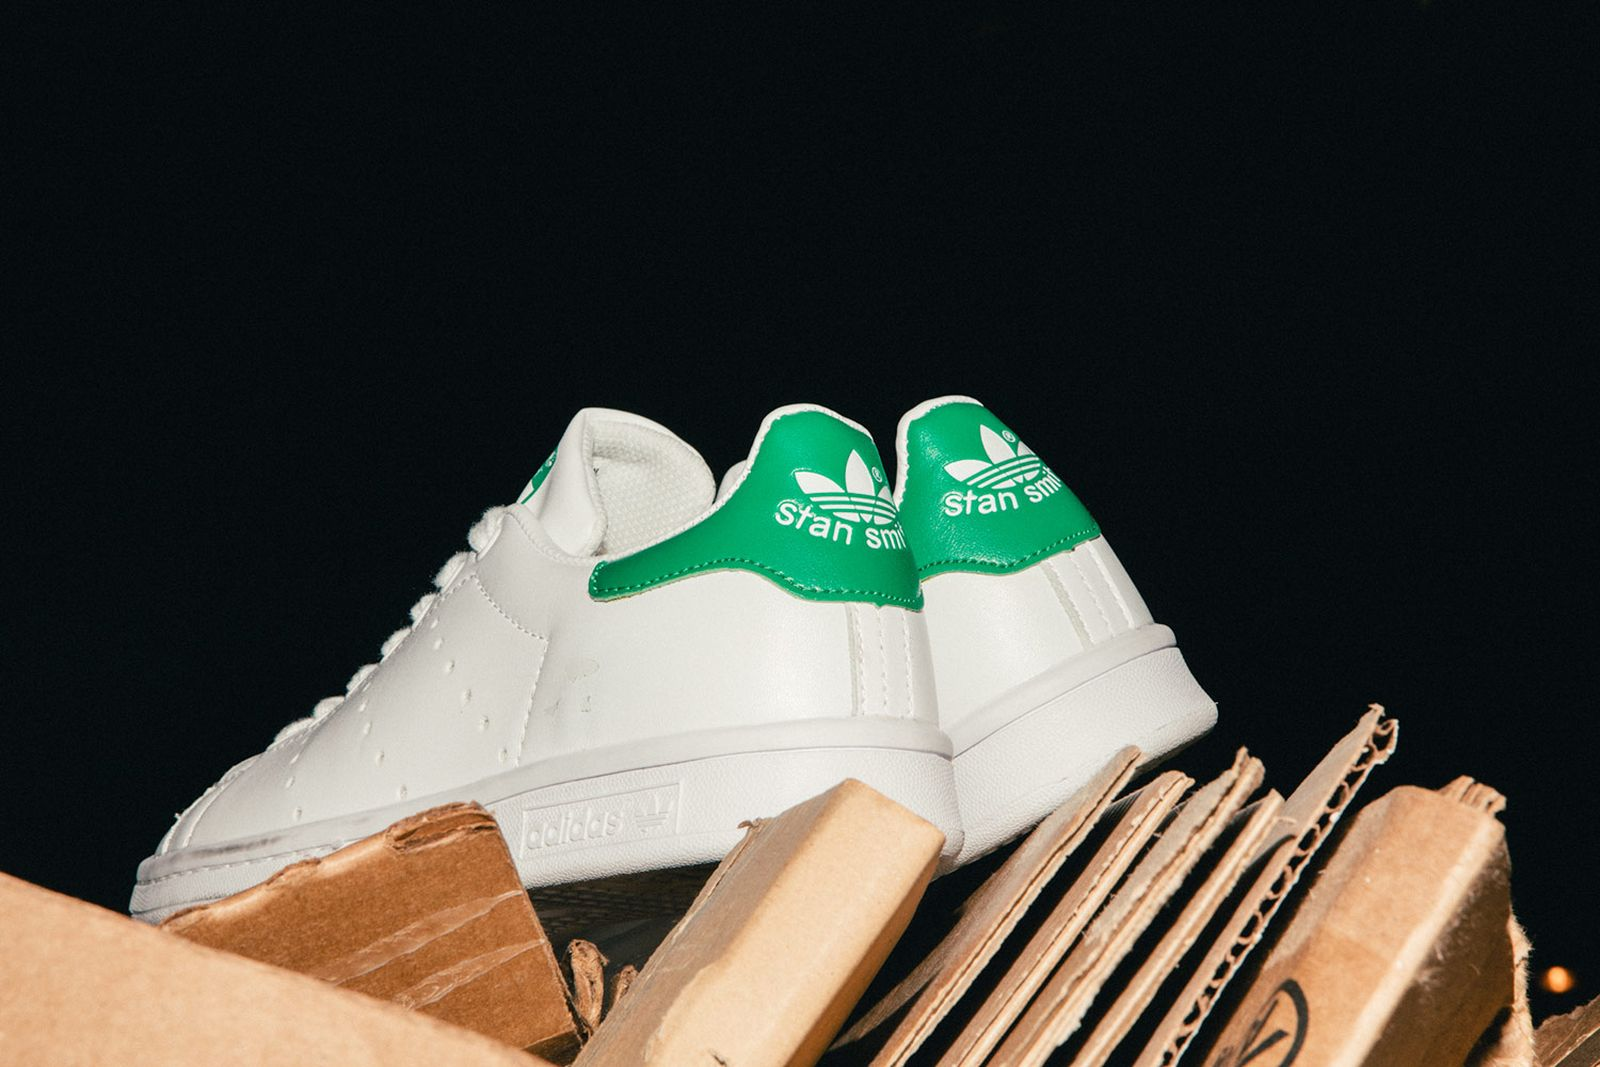 Legit-Check-Fake-Sneakers-Highsnobiety-09